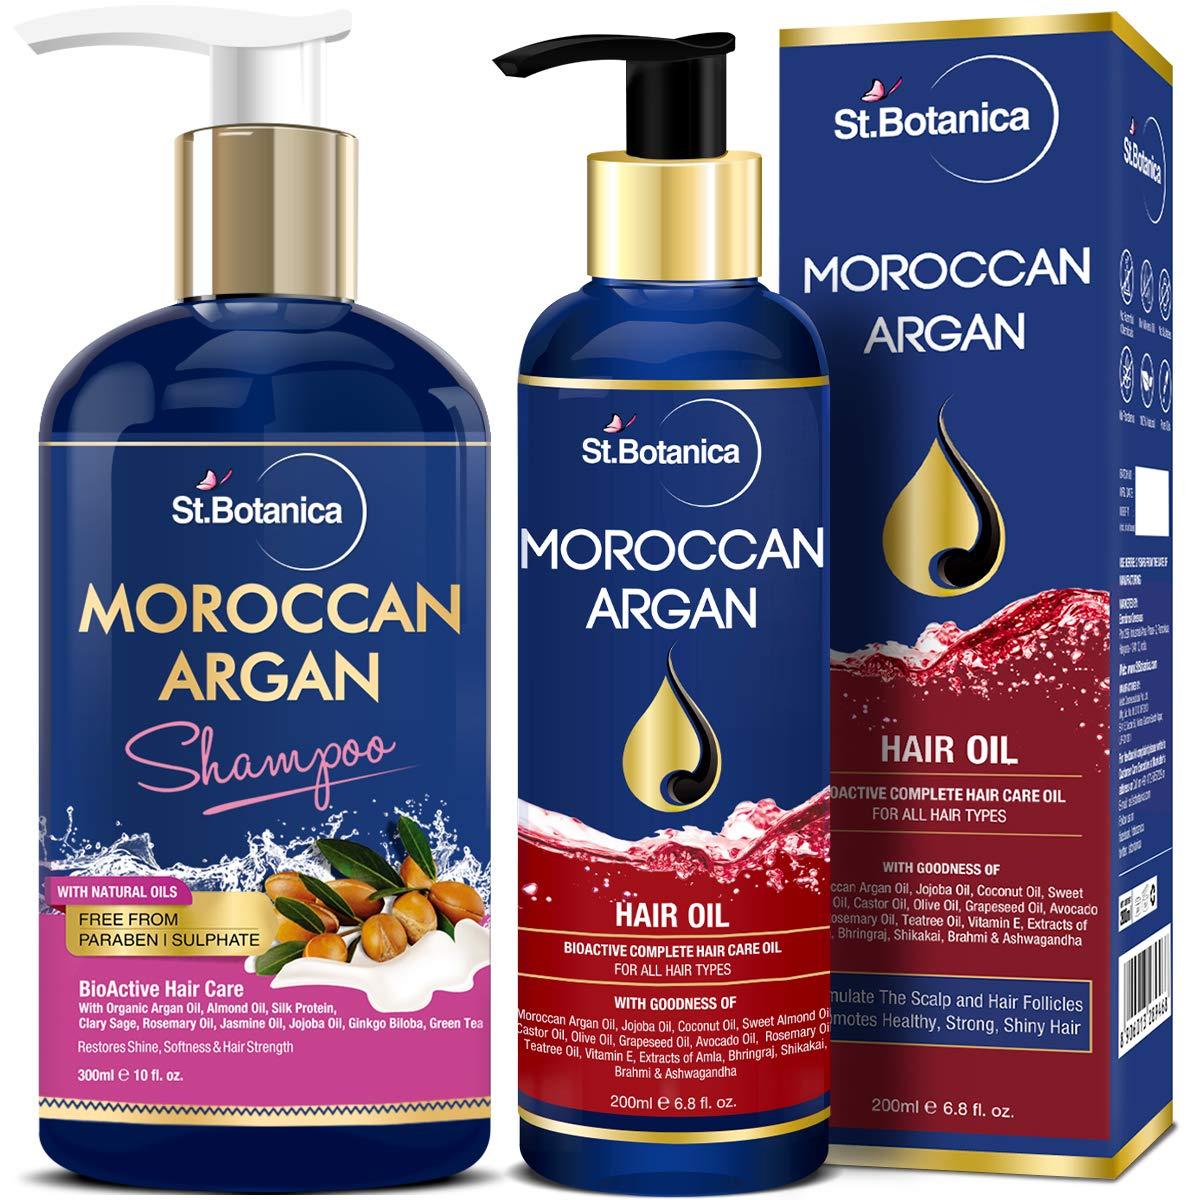 StBotanica Moroccan Argan Shampoo - Best Organic shampoo in India